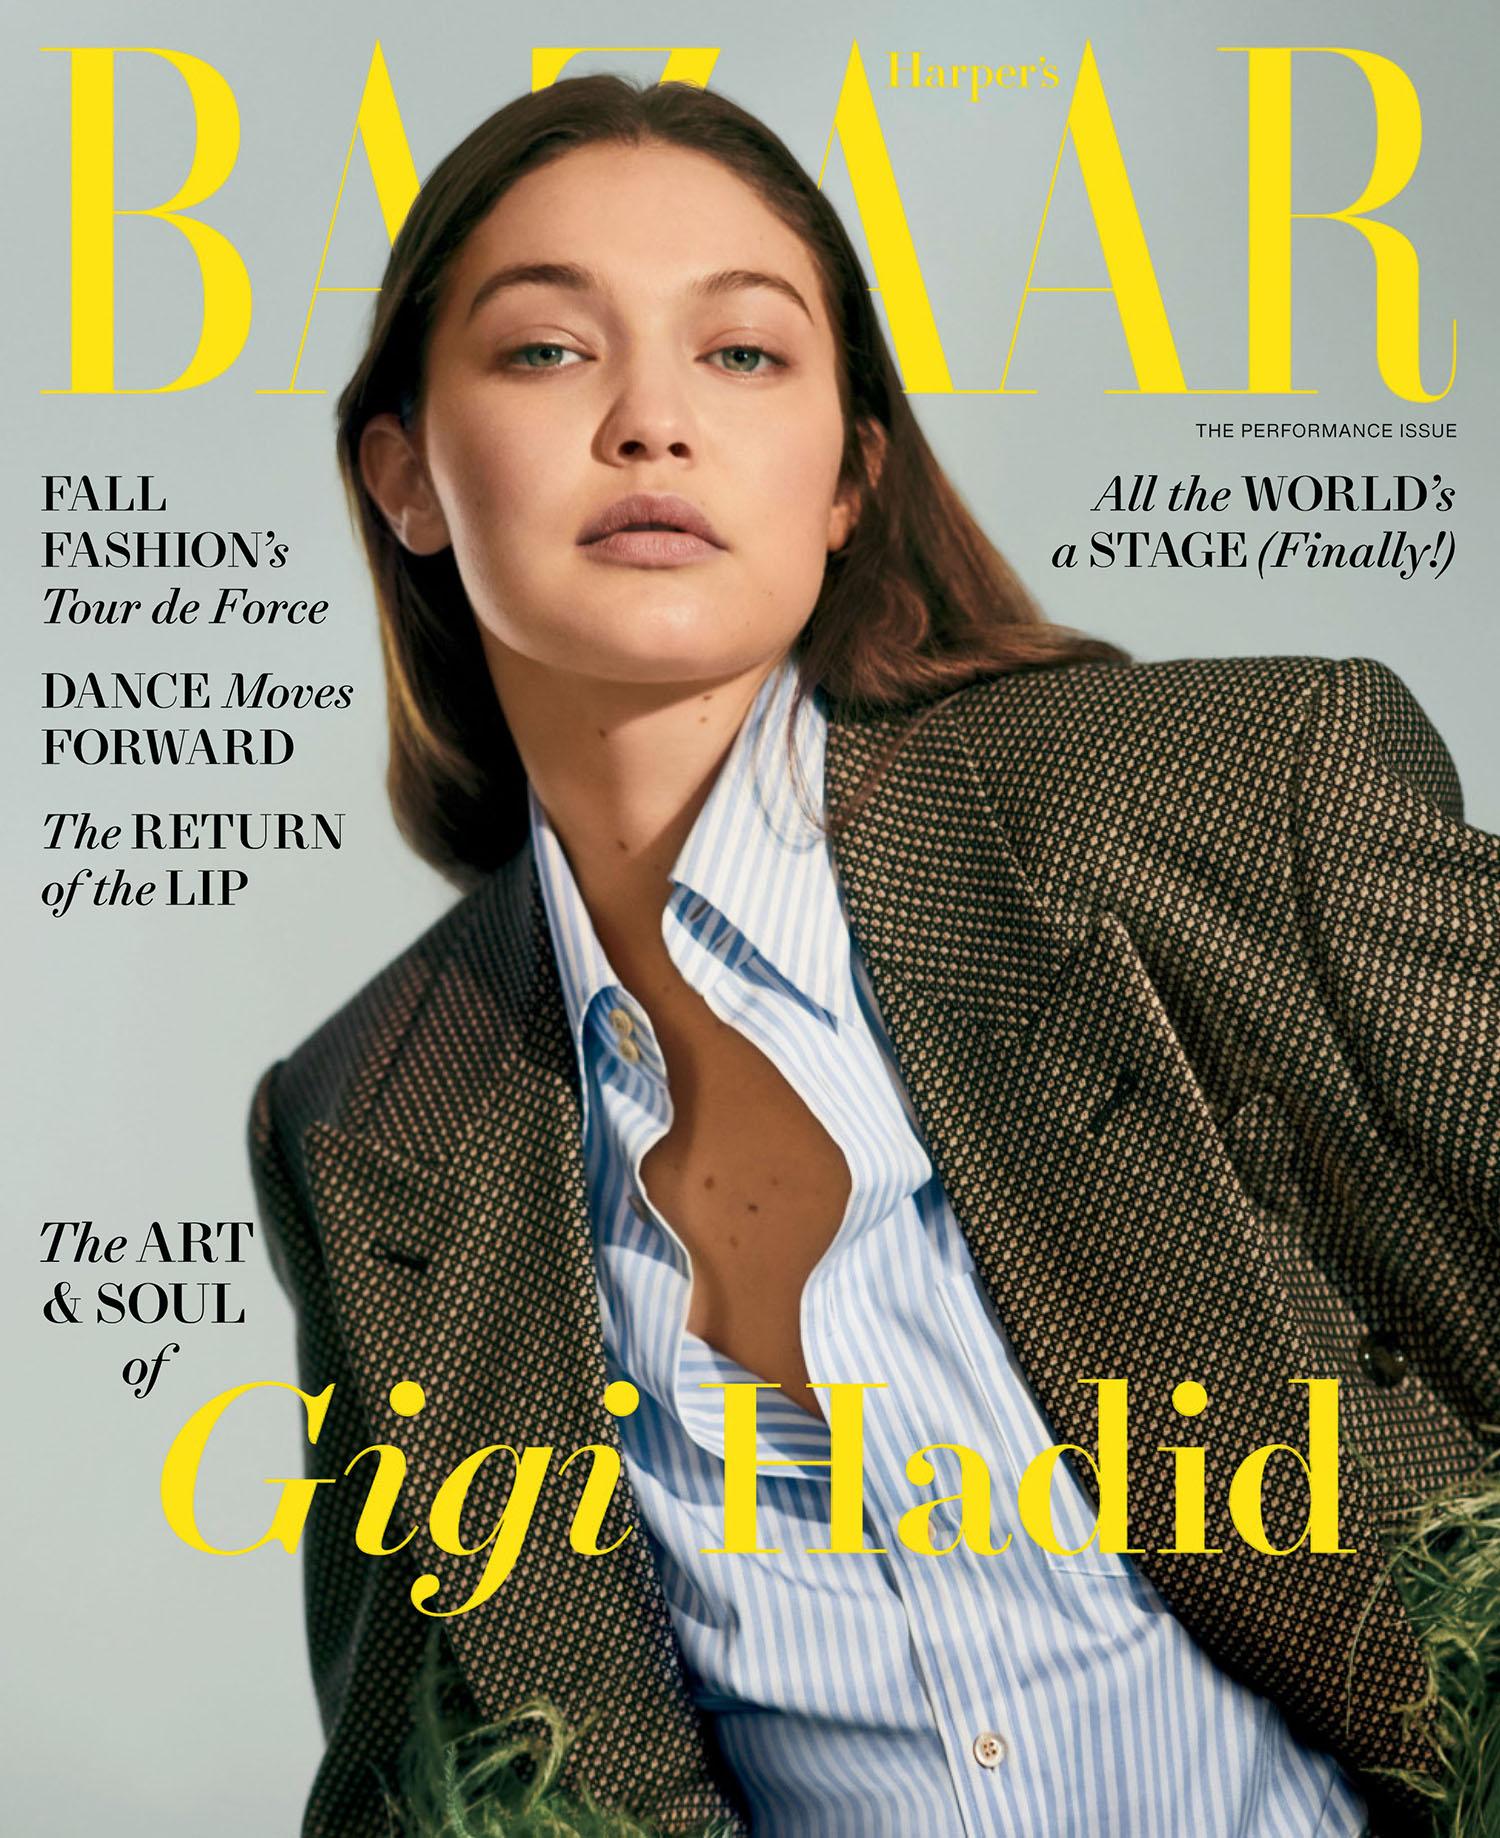 Gigi Hadid covers Harper's Bazaar US August 2021 by Collier Schorr